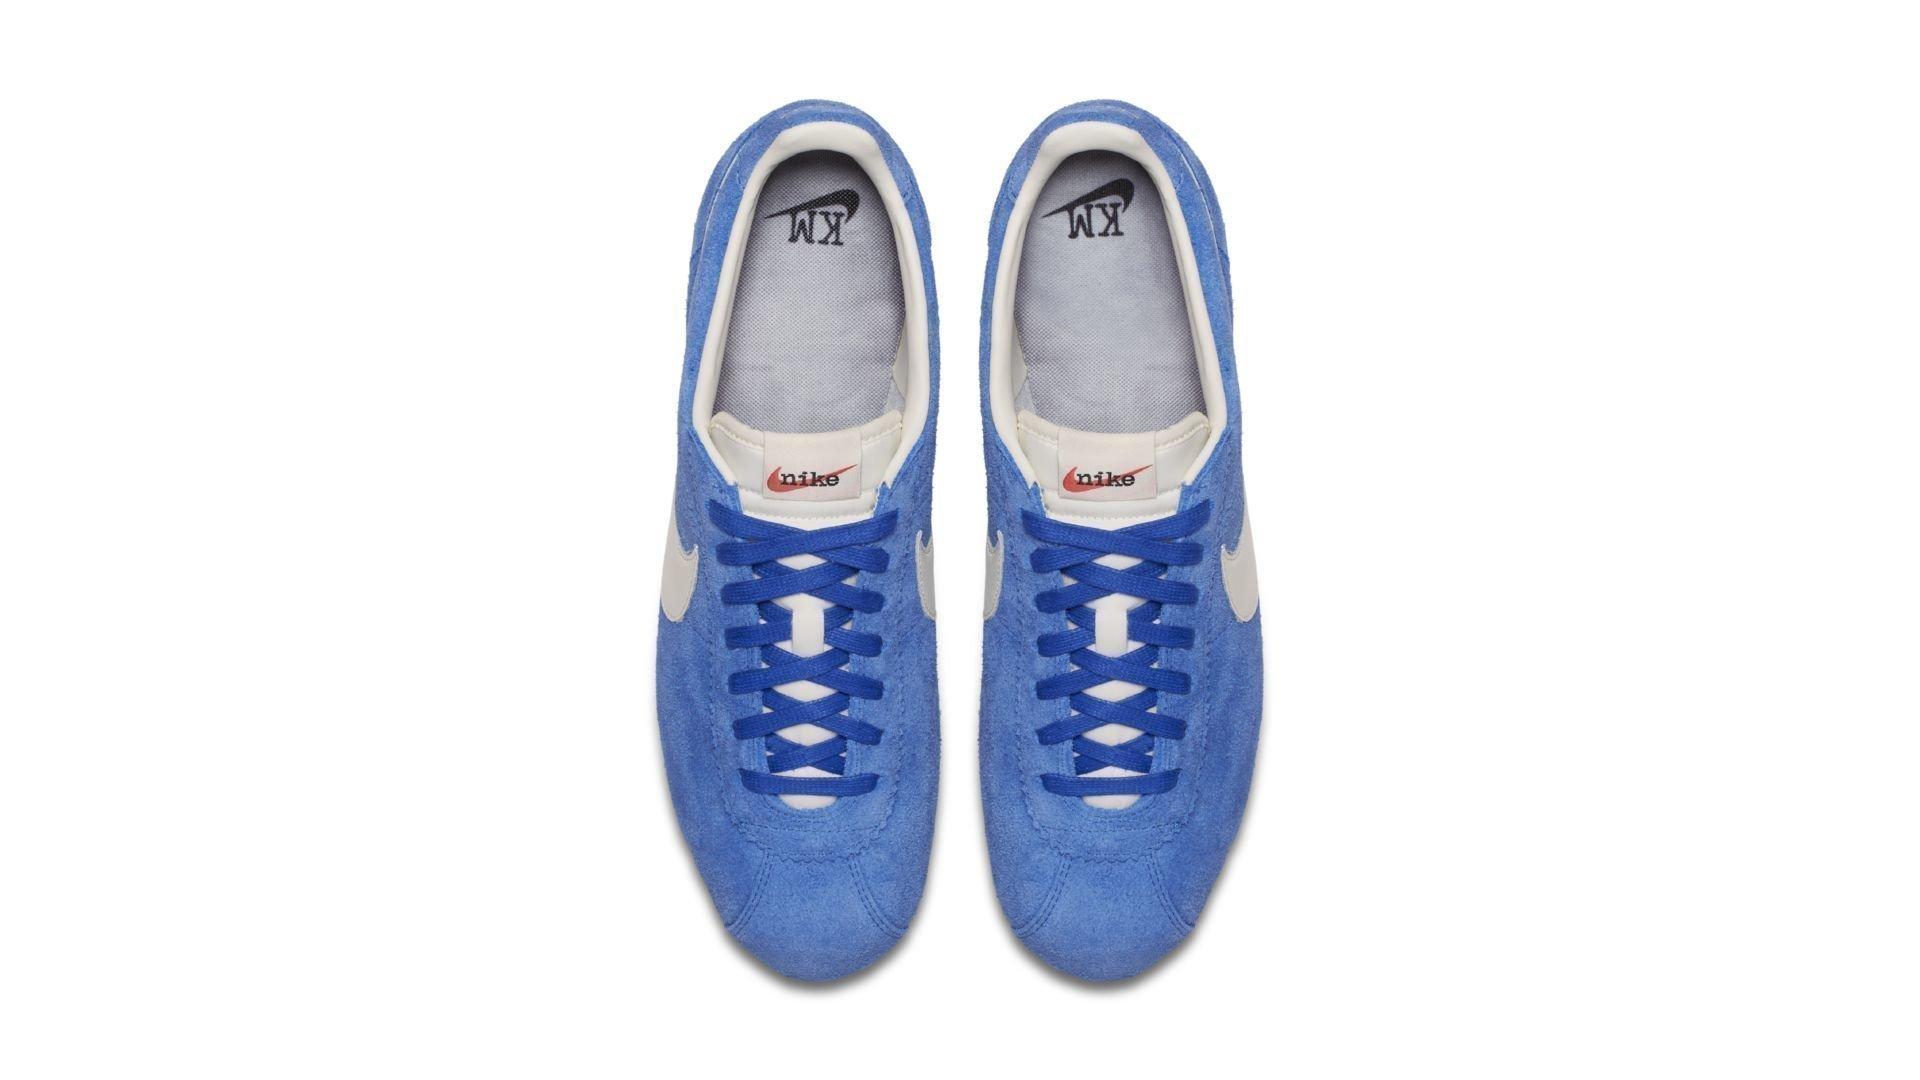 Nike Classic Cortez Kenny Moore Broken Foot (943088-400)